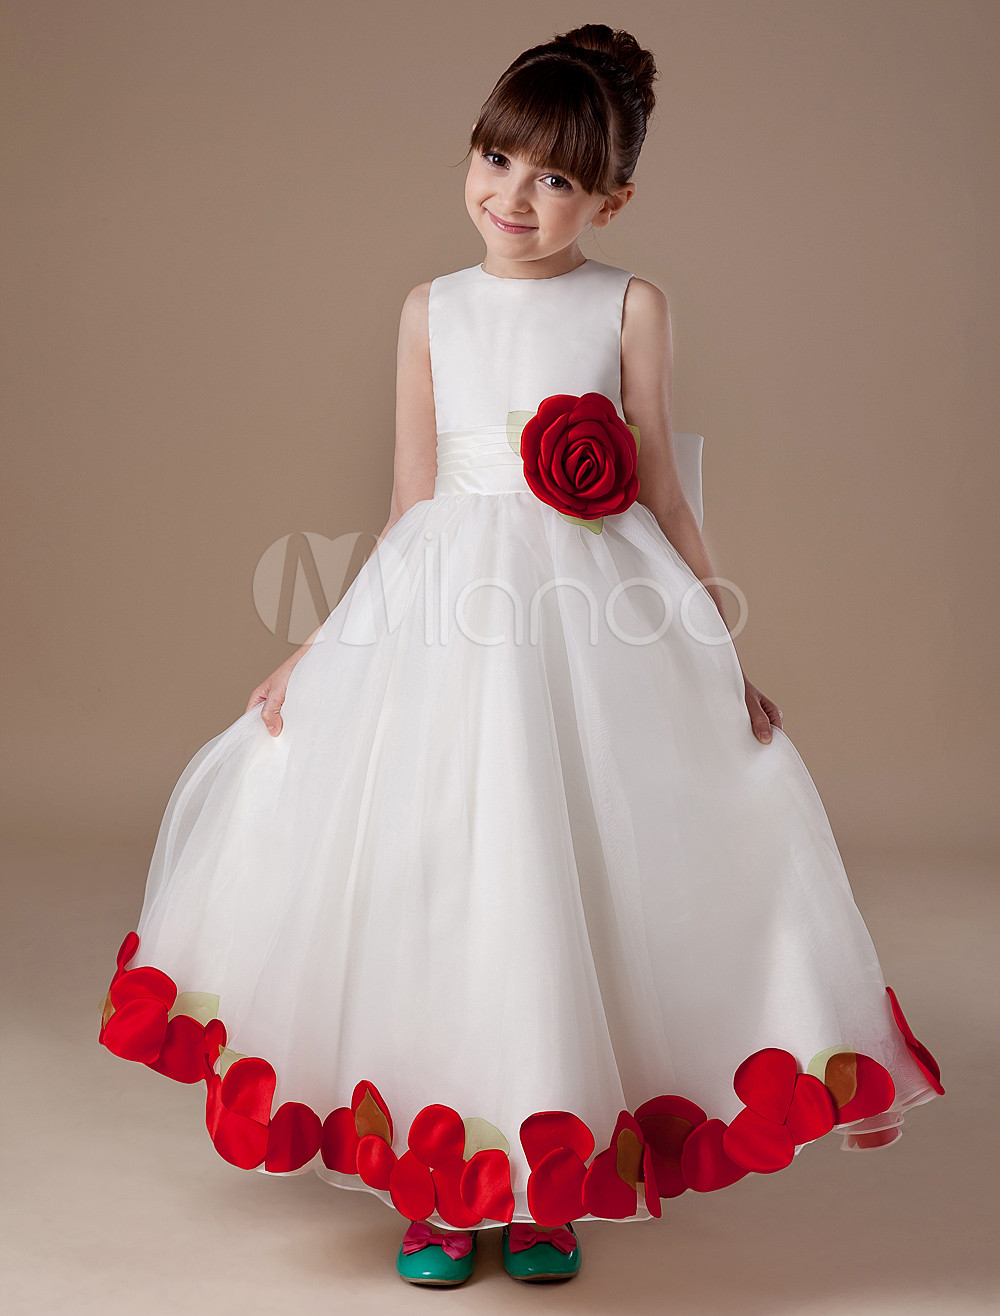 White Flower Girl Dress Bow Applique Sash Princess Dress